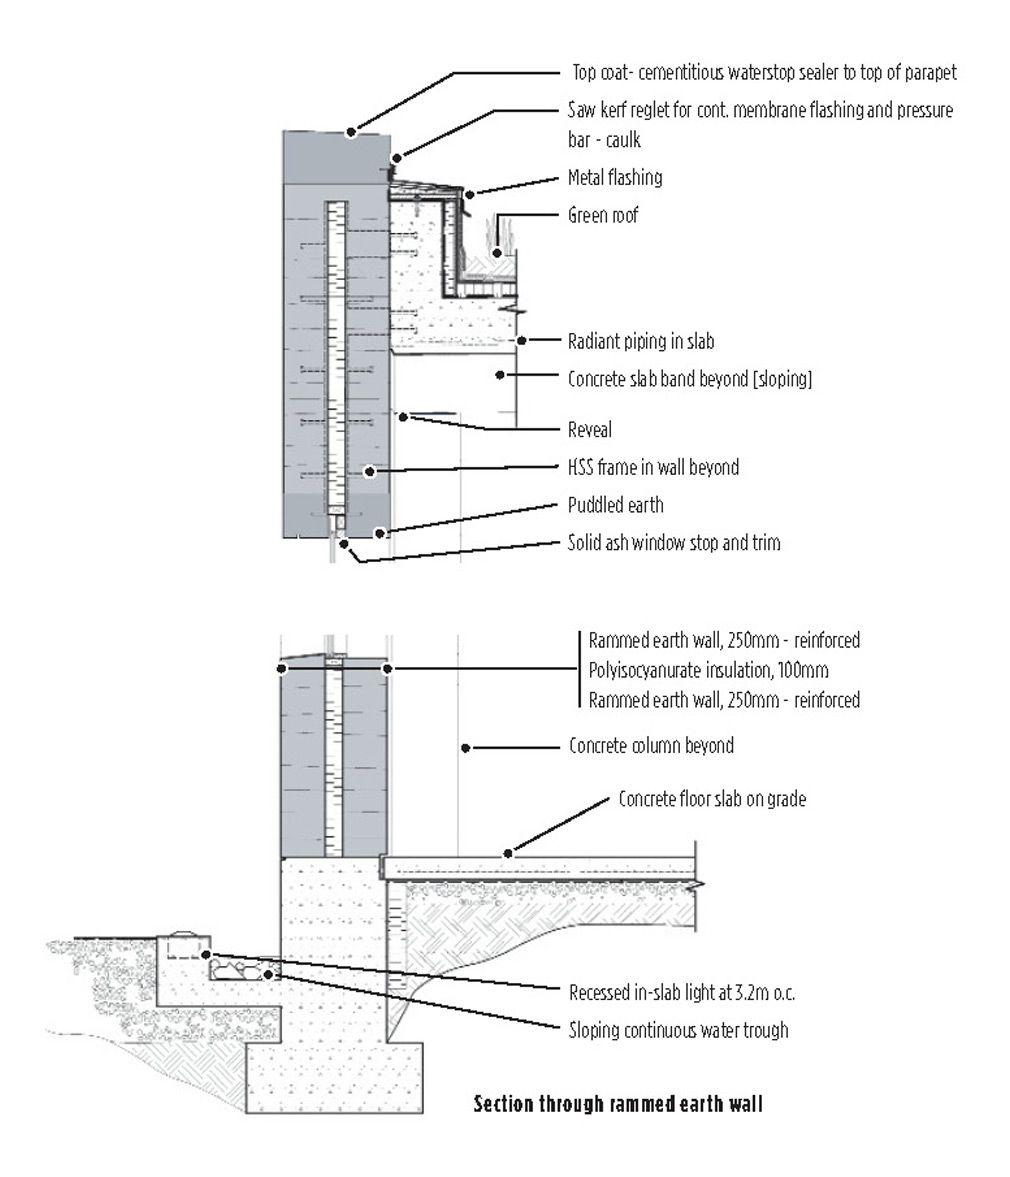 8 Nk Dr03 Jpg 1010 1177 Rammed Earth Homes Rammed Earth Rammed Earth Wall